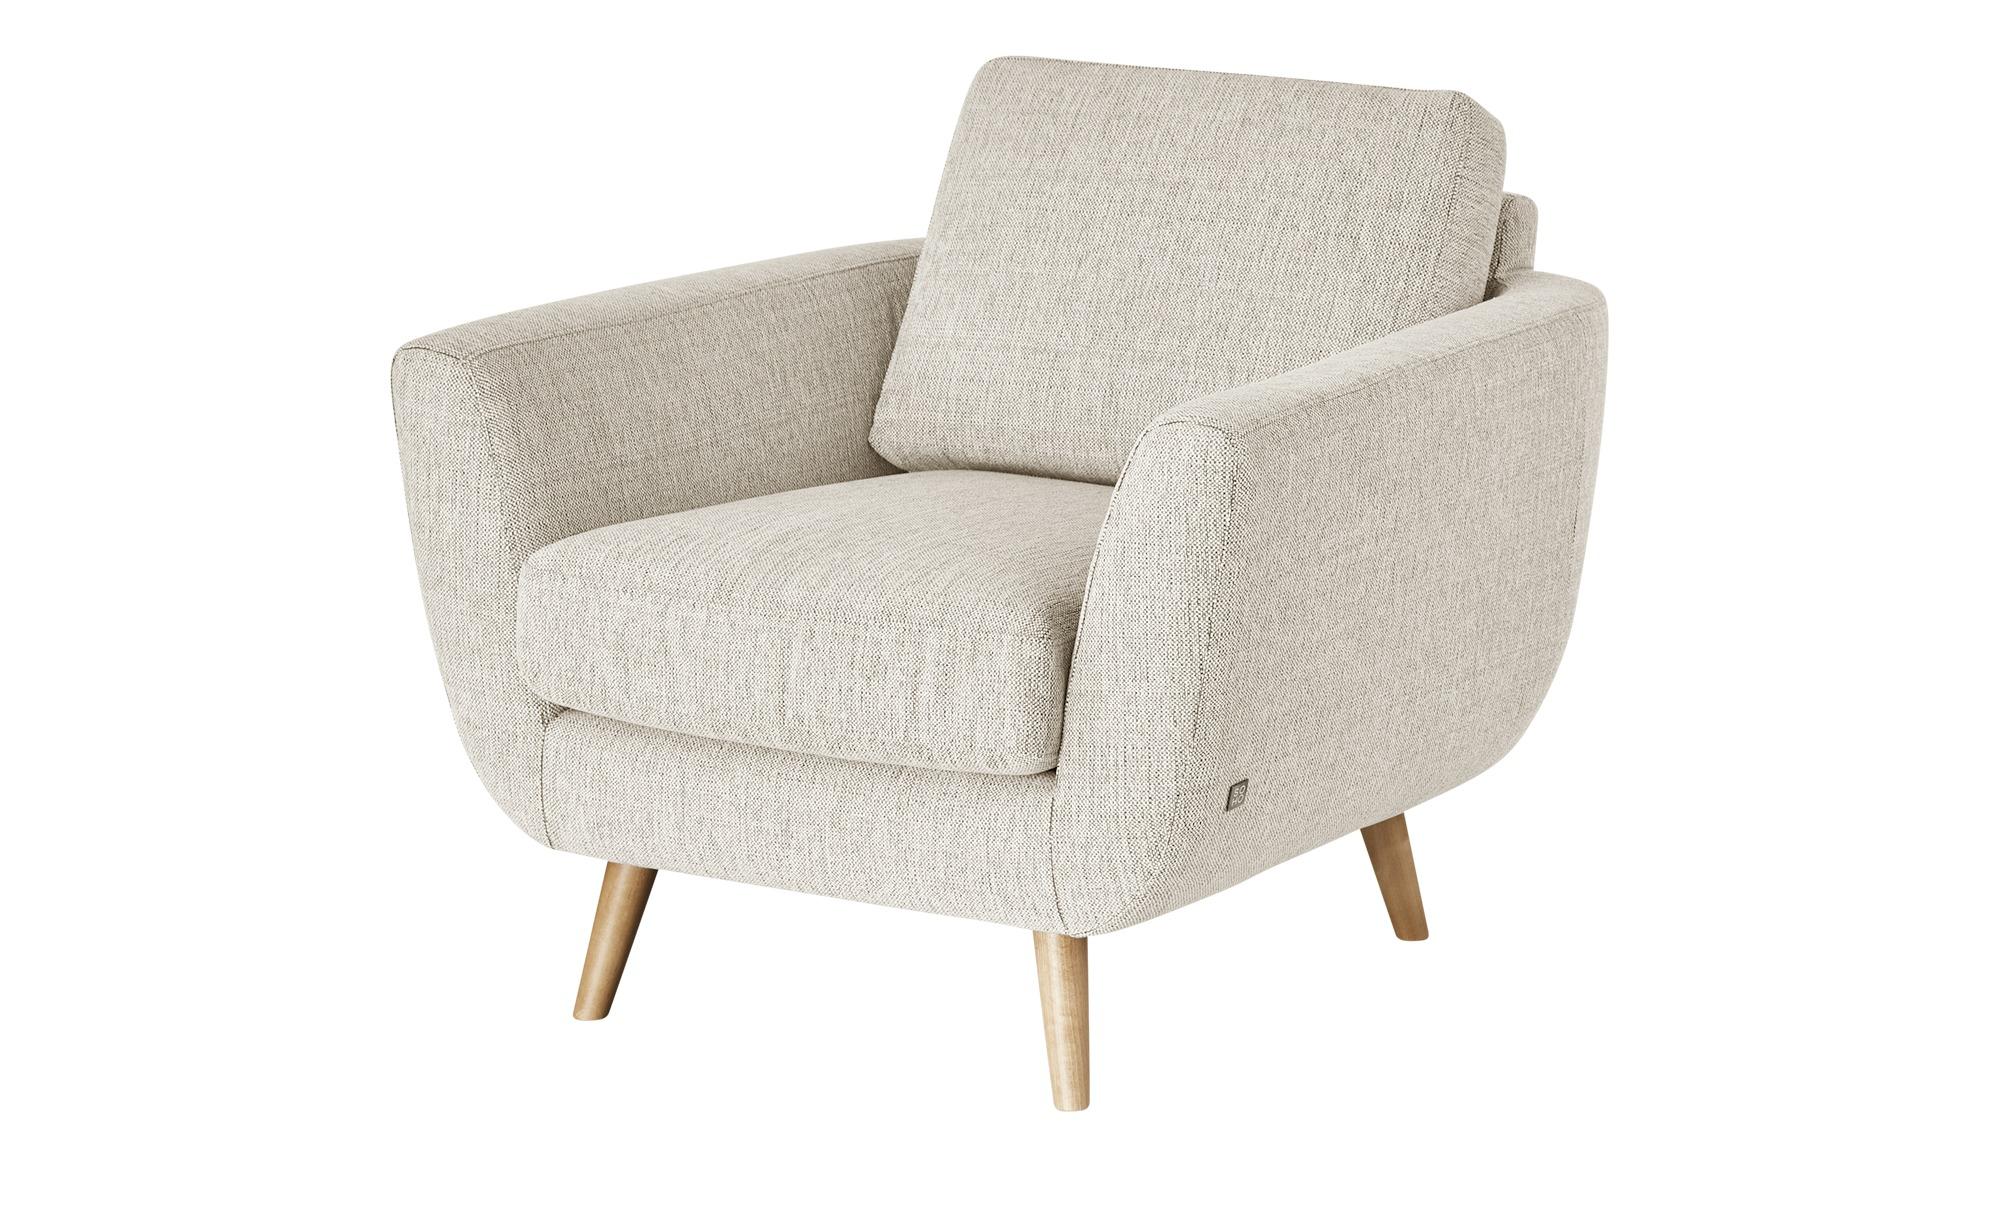 SOHO Sessel - beige - Polstermöbel > Sessel > Ohrensessel - Möbel Kraft günstig online kaufen